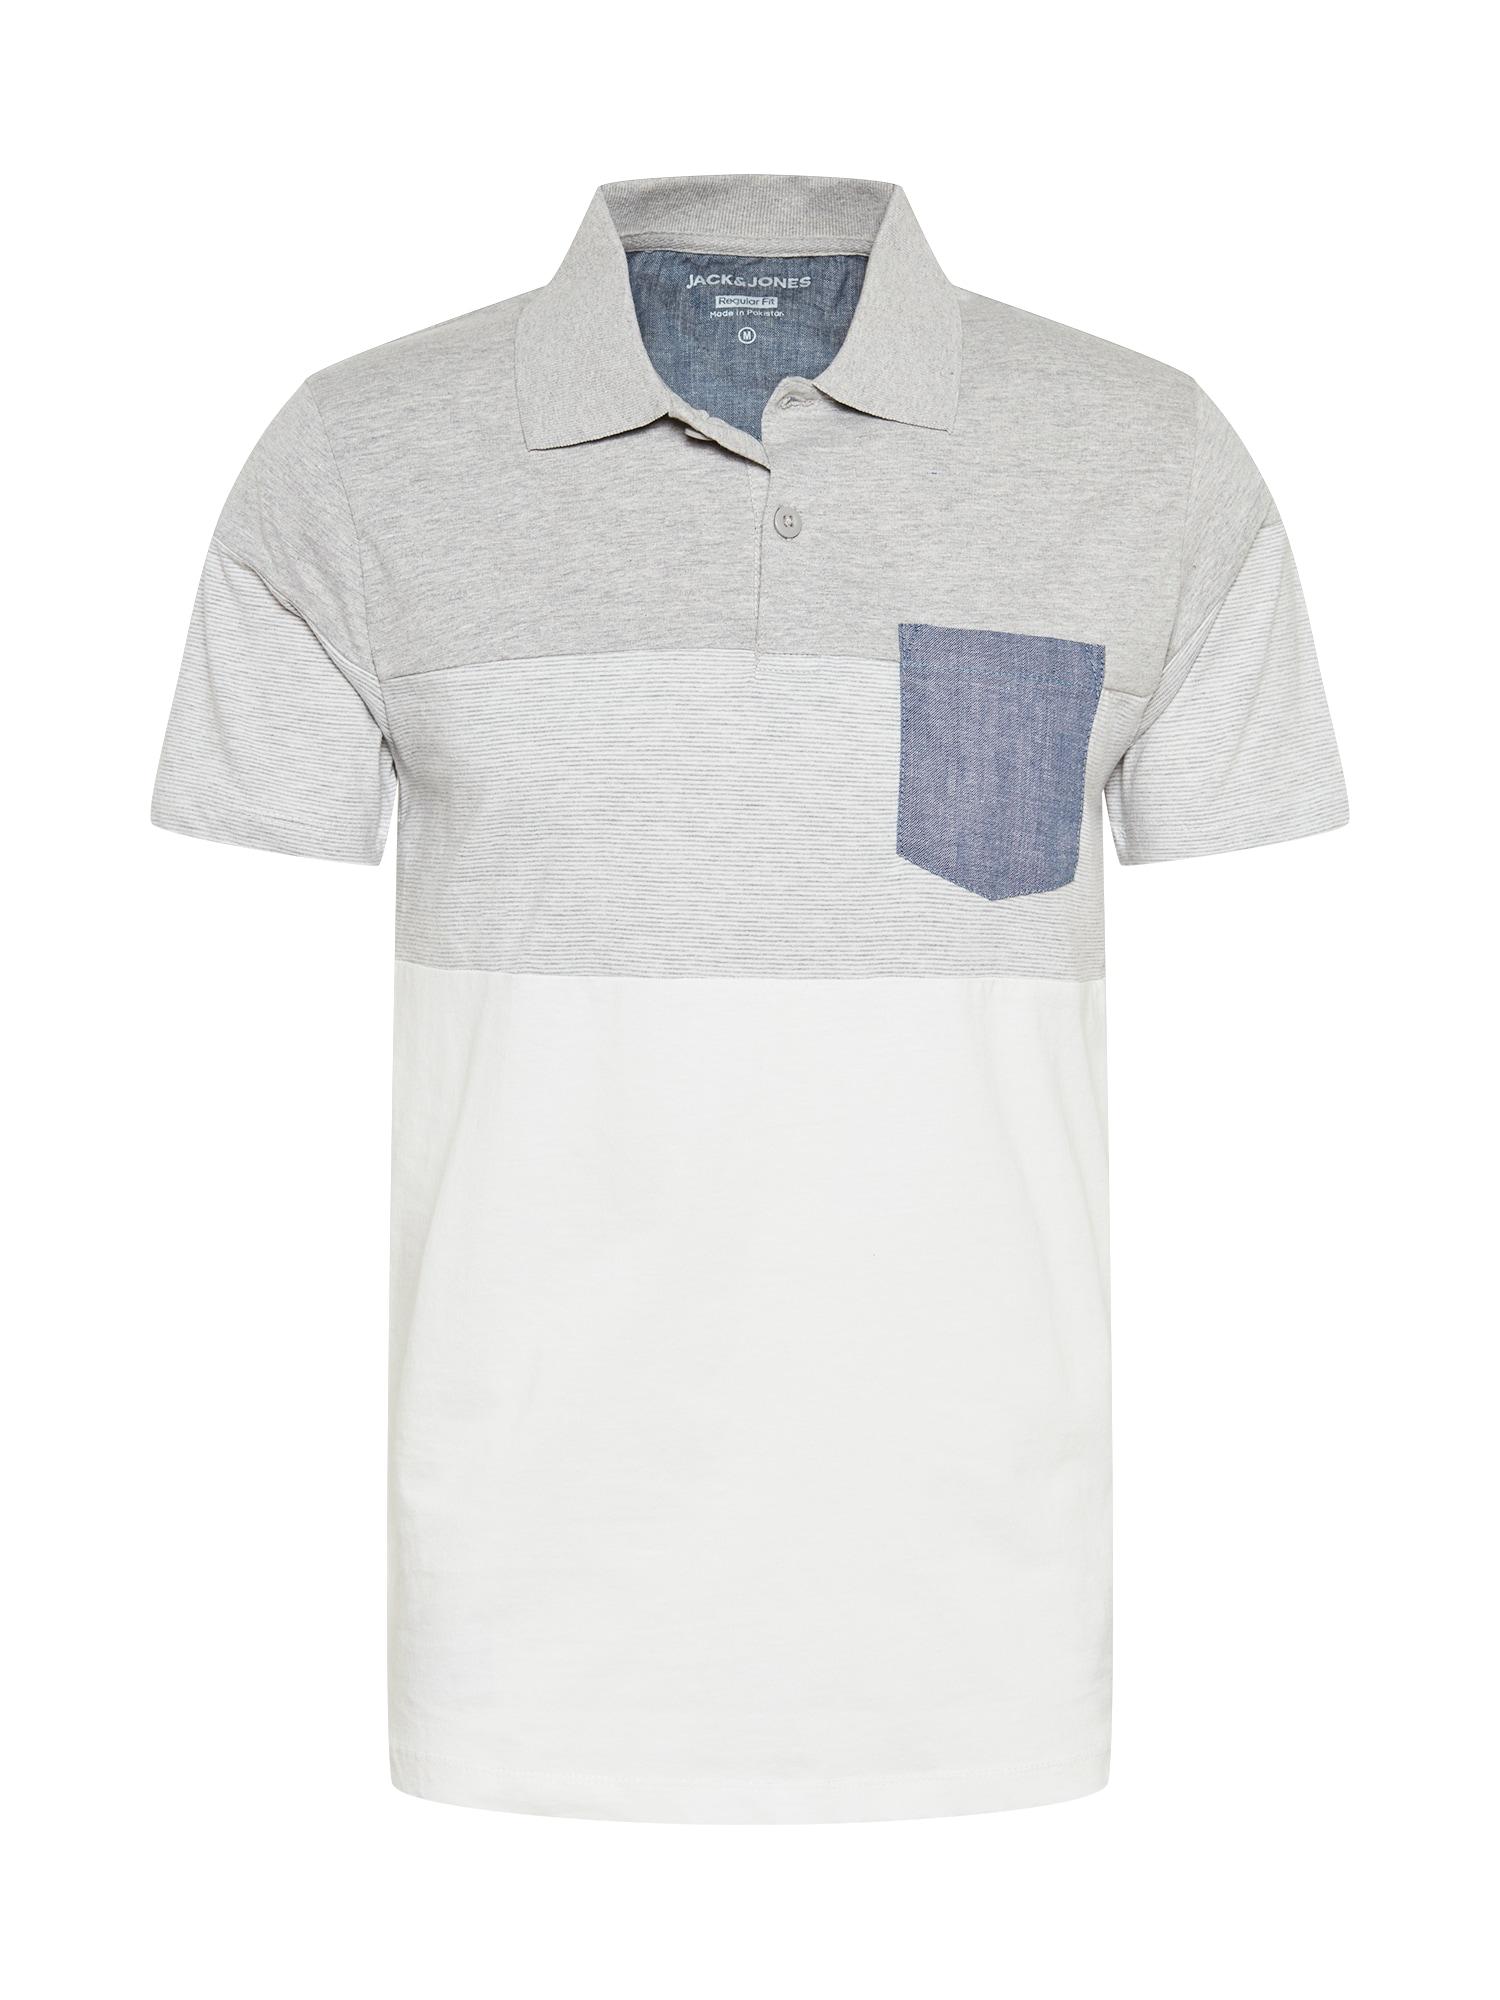 JACK & JONES Marškinėliai pilka / balta / melsvai pilka